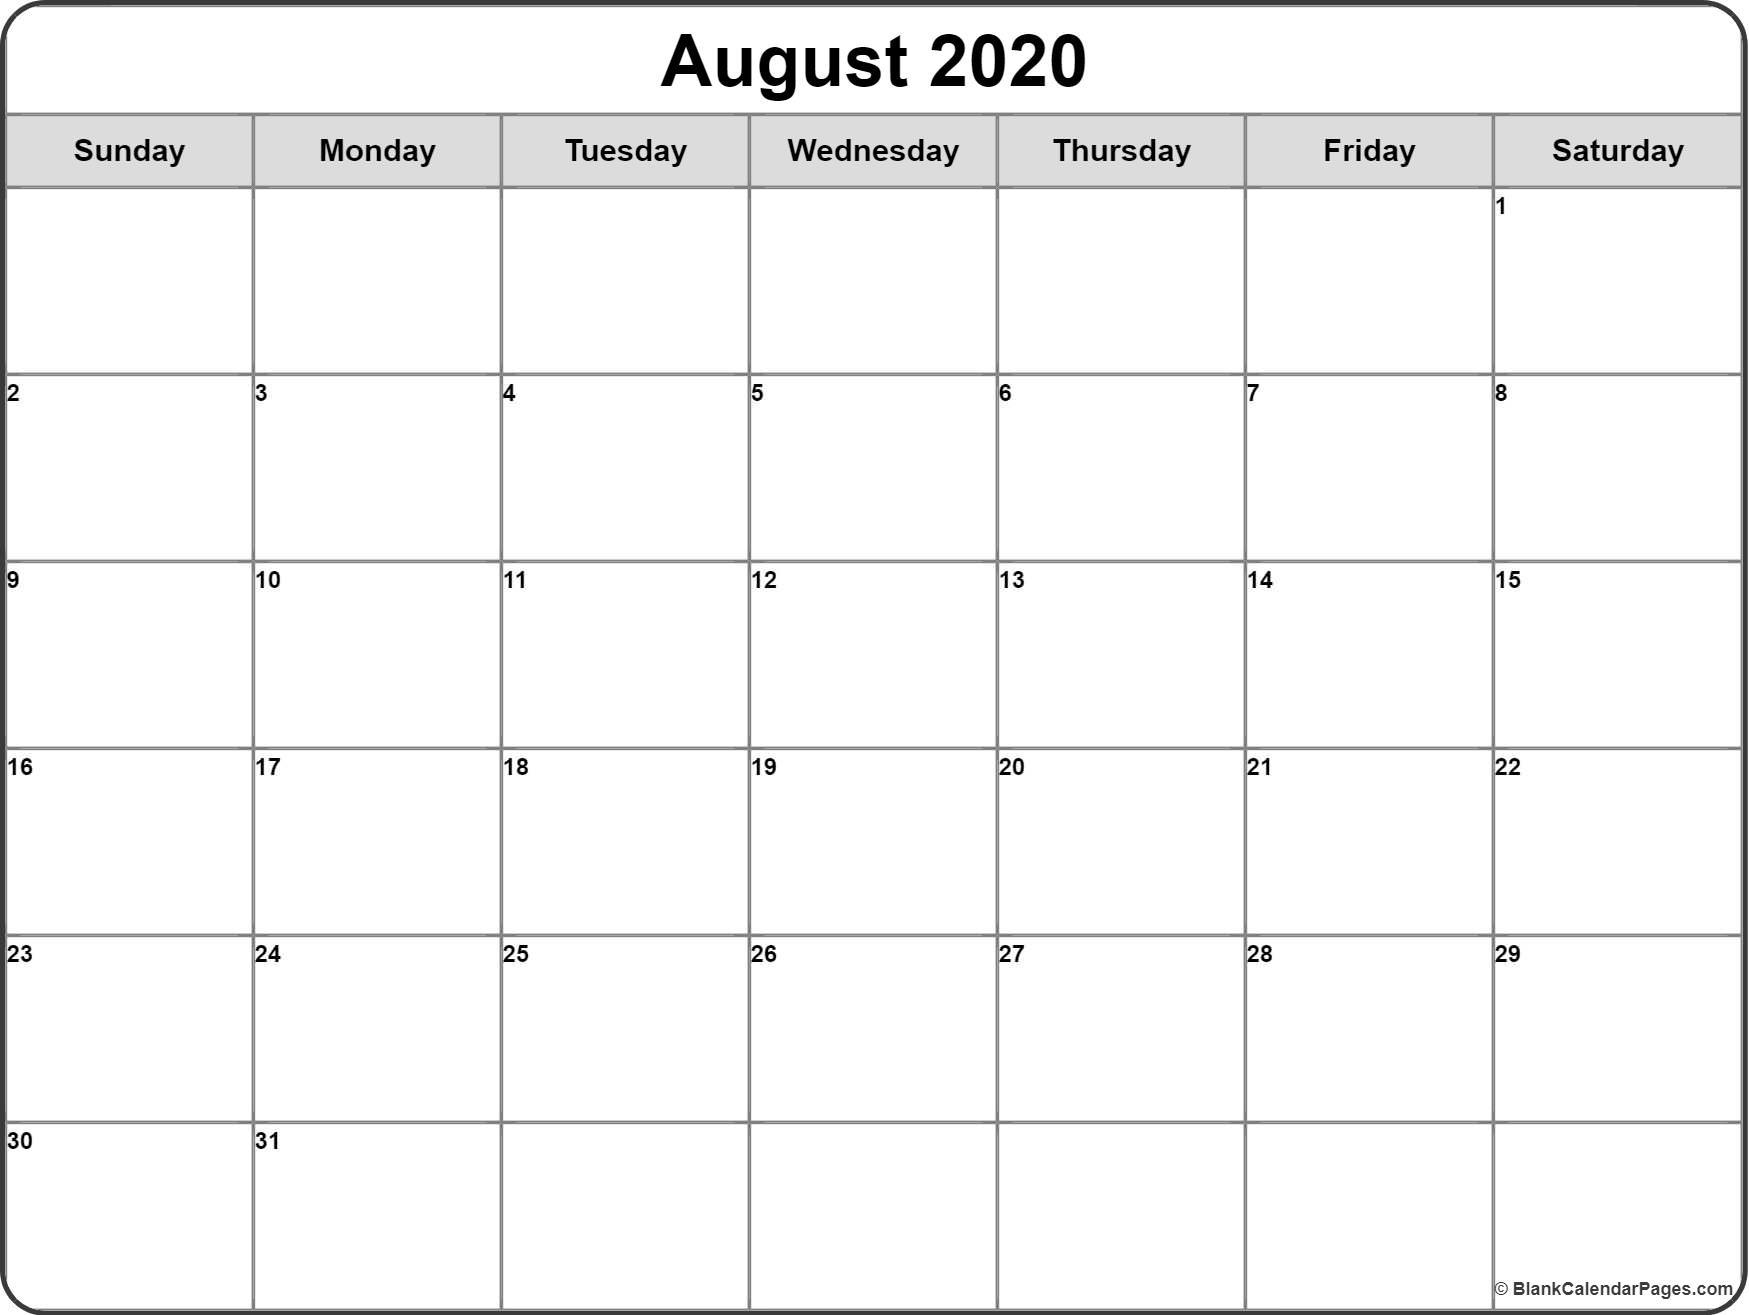 August 2020 Calendar   Free Printable Monthly Calendars